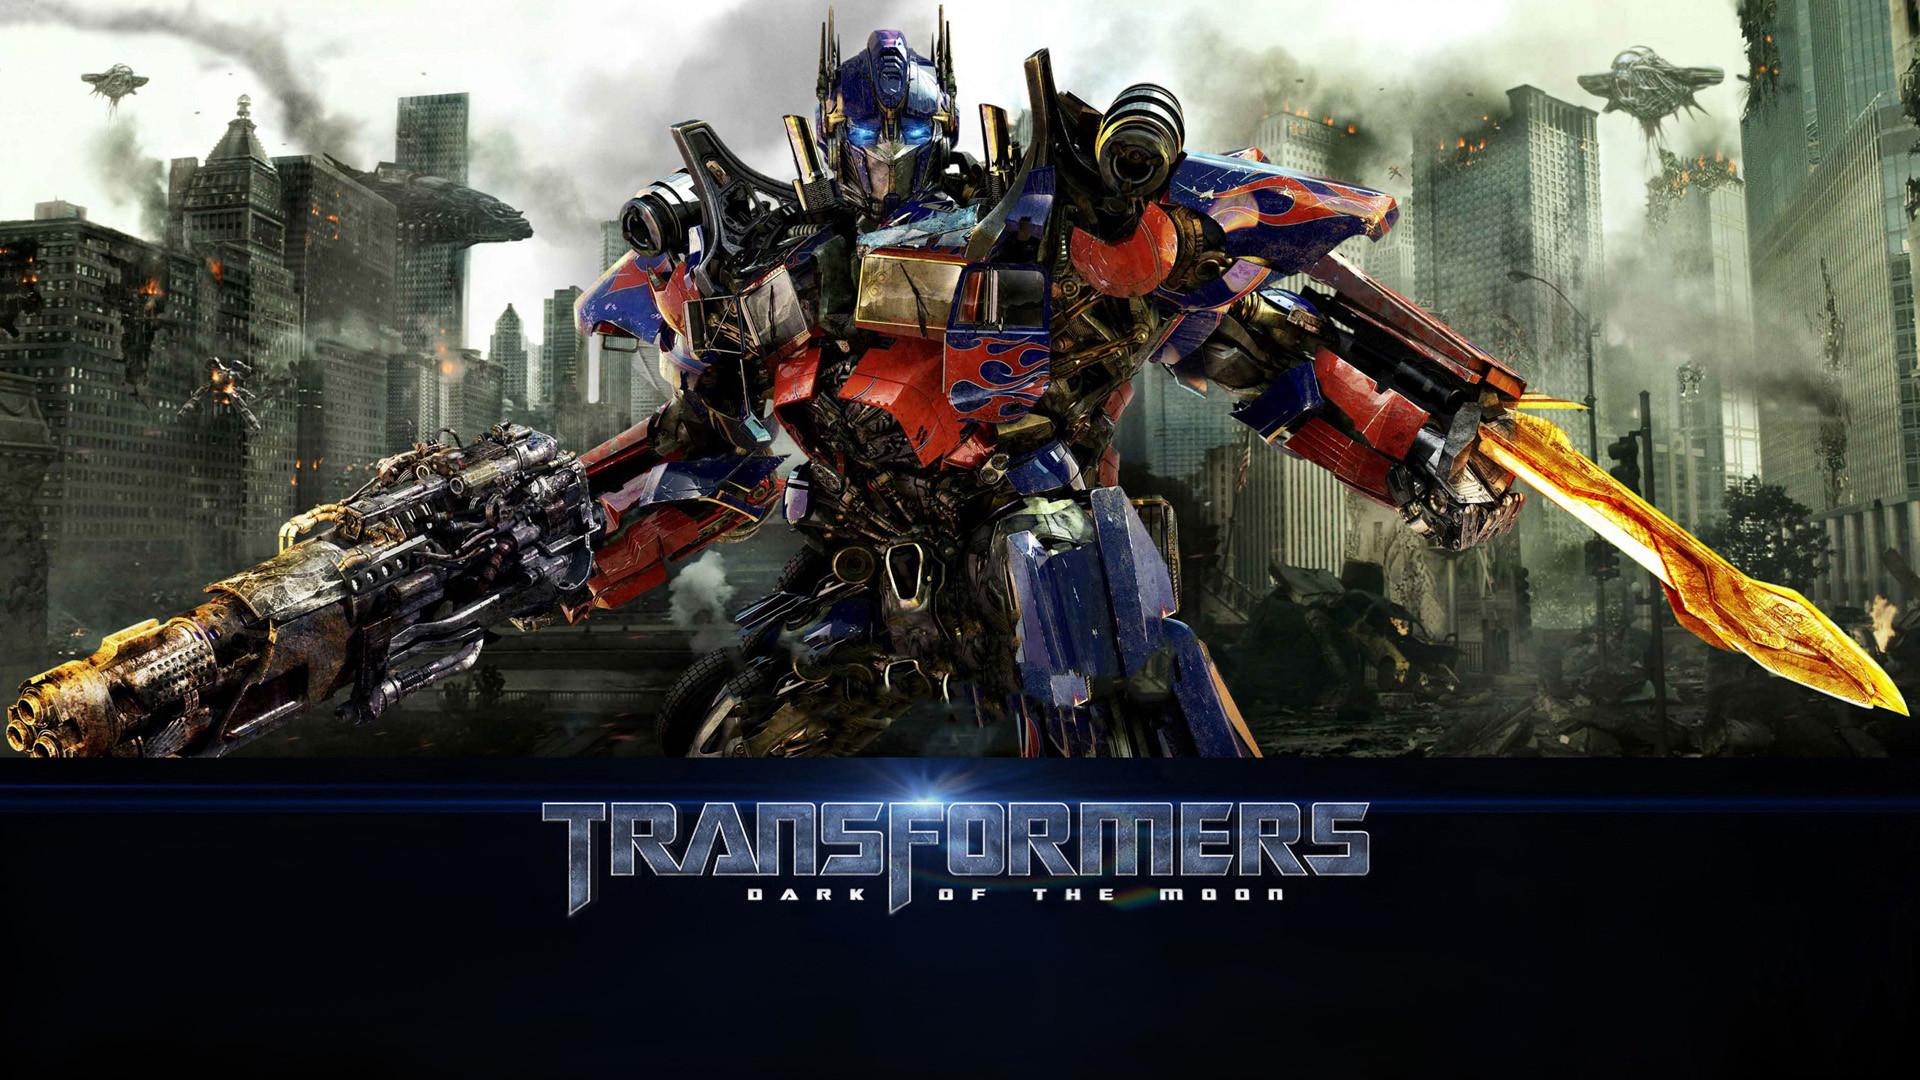 Transformers 3 Dark of the Moon Wallpapers (1920 x 1080 pixels